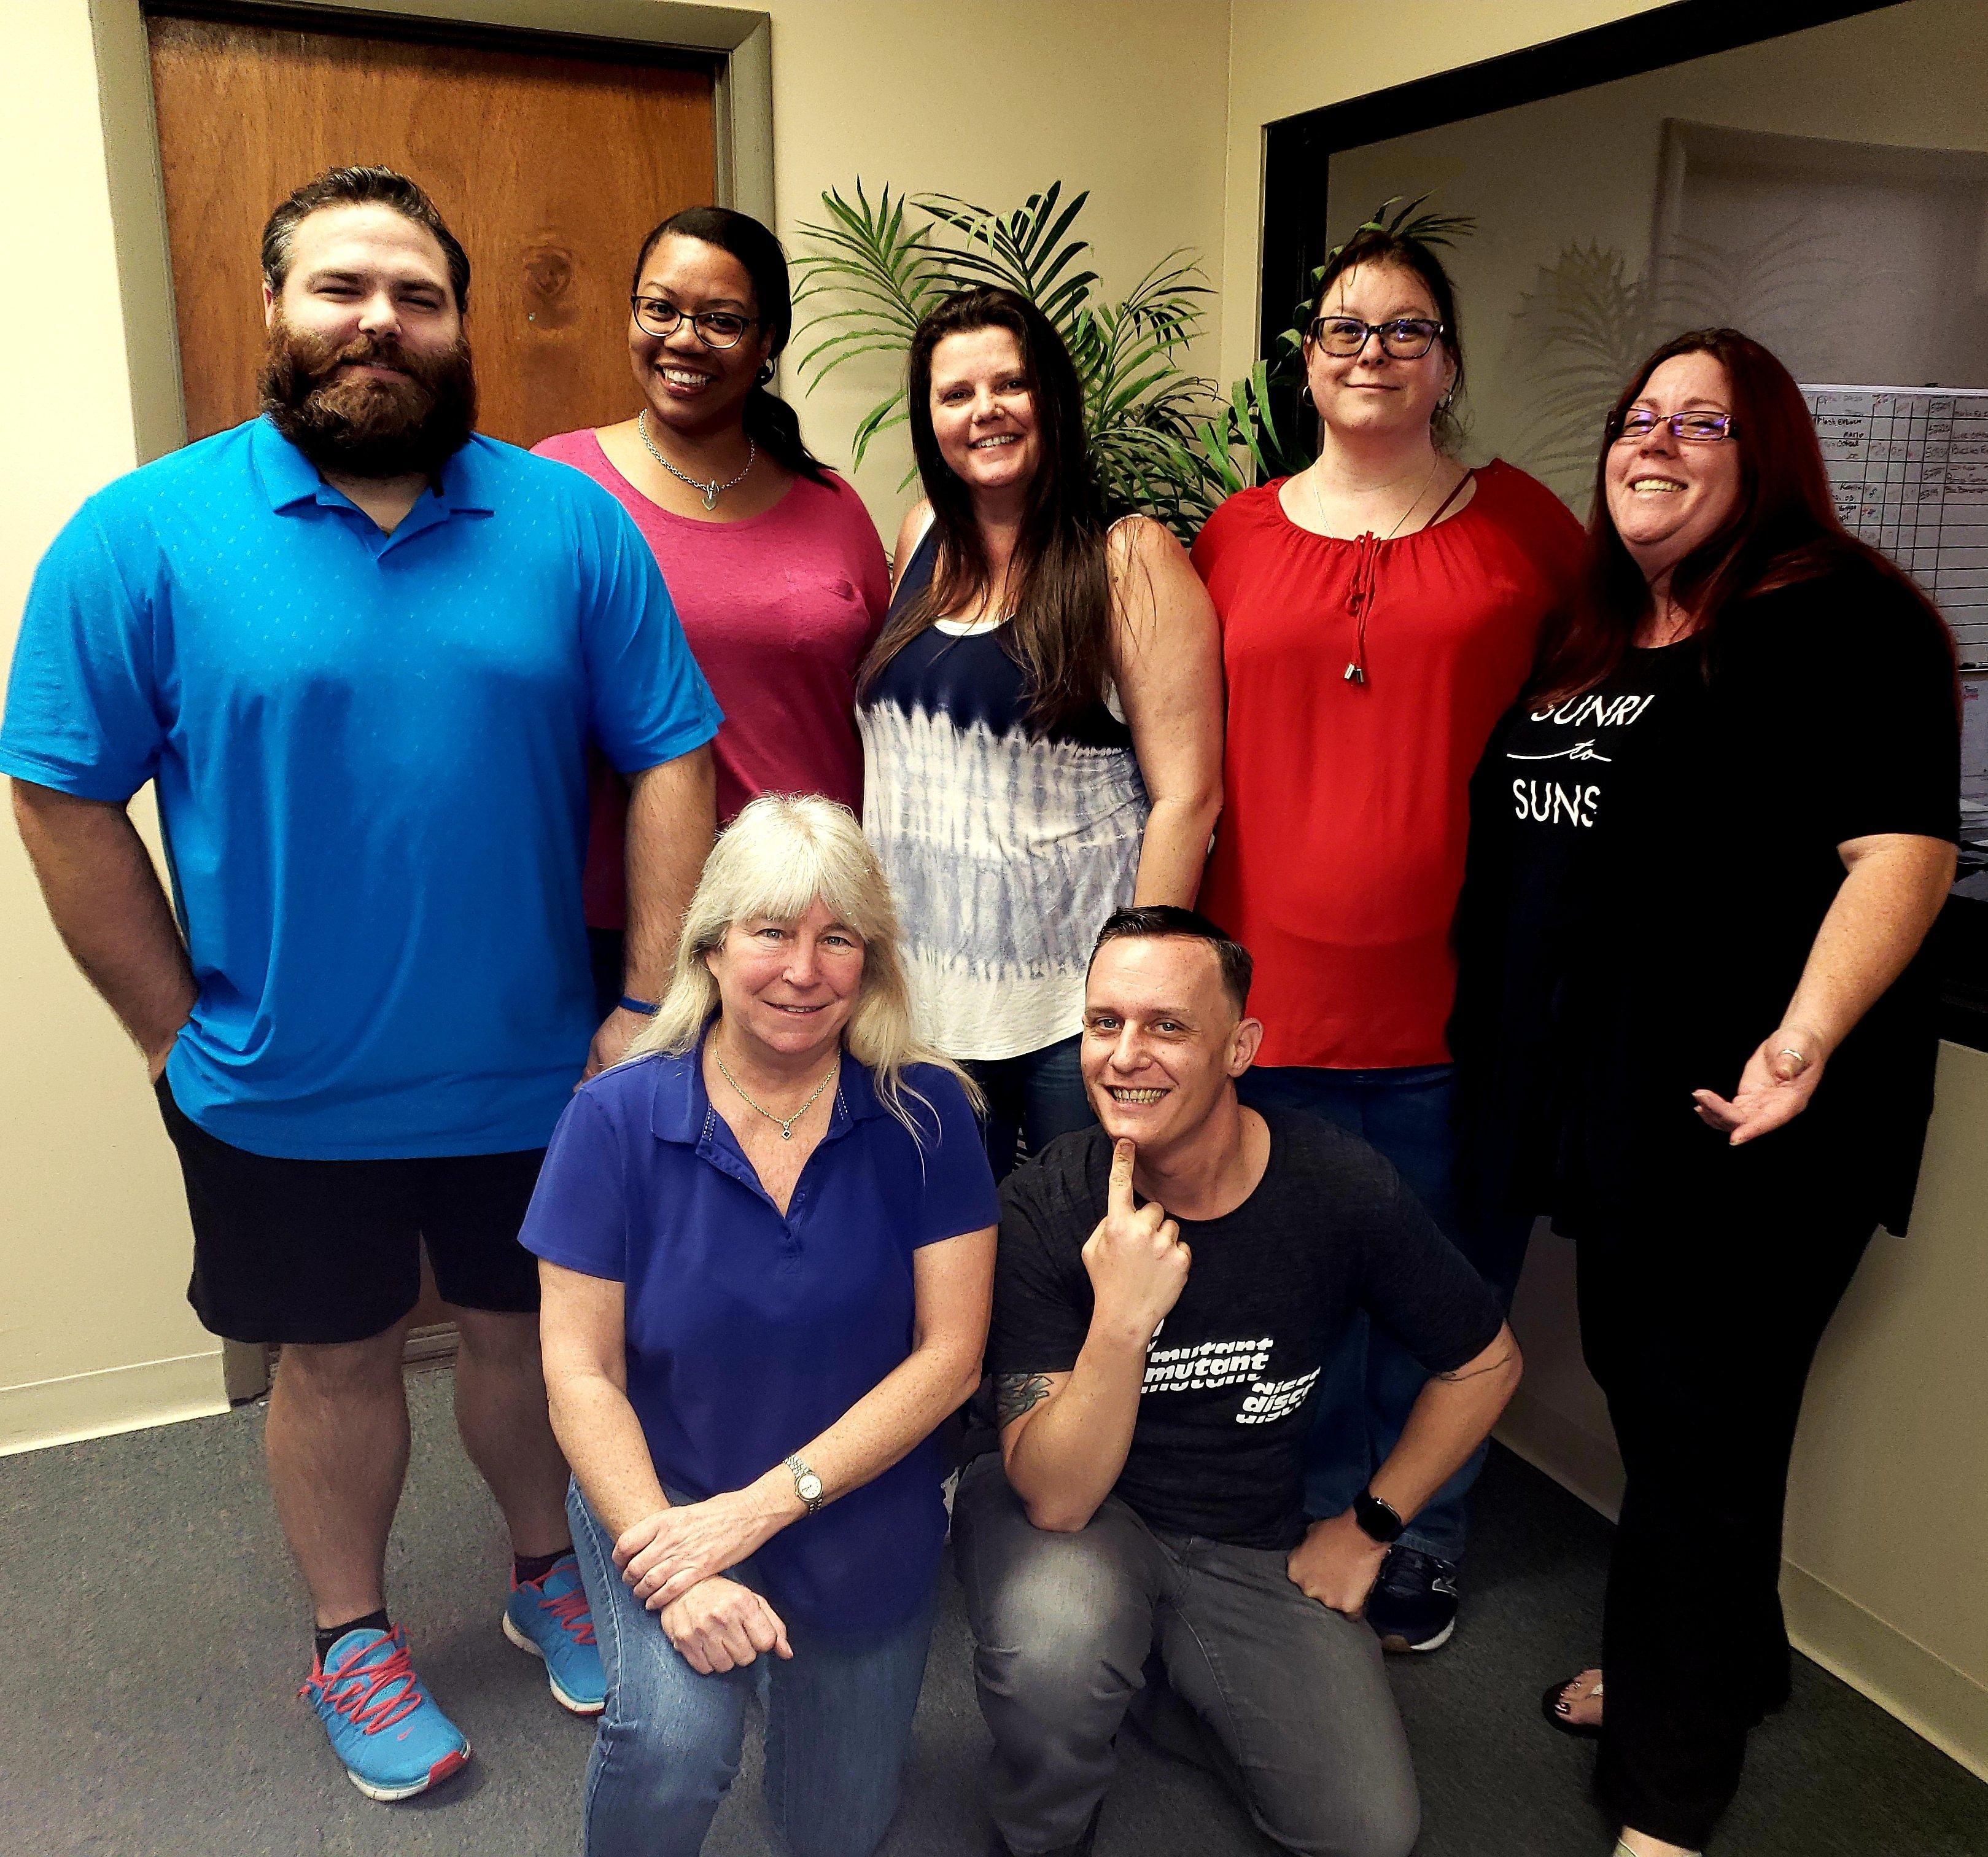 A few of the IcareLabs team members